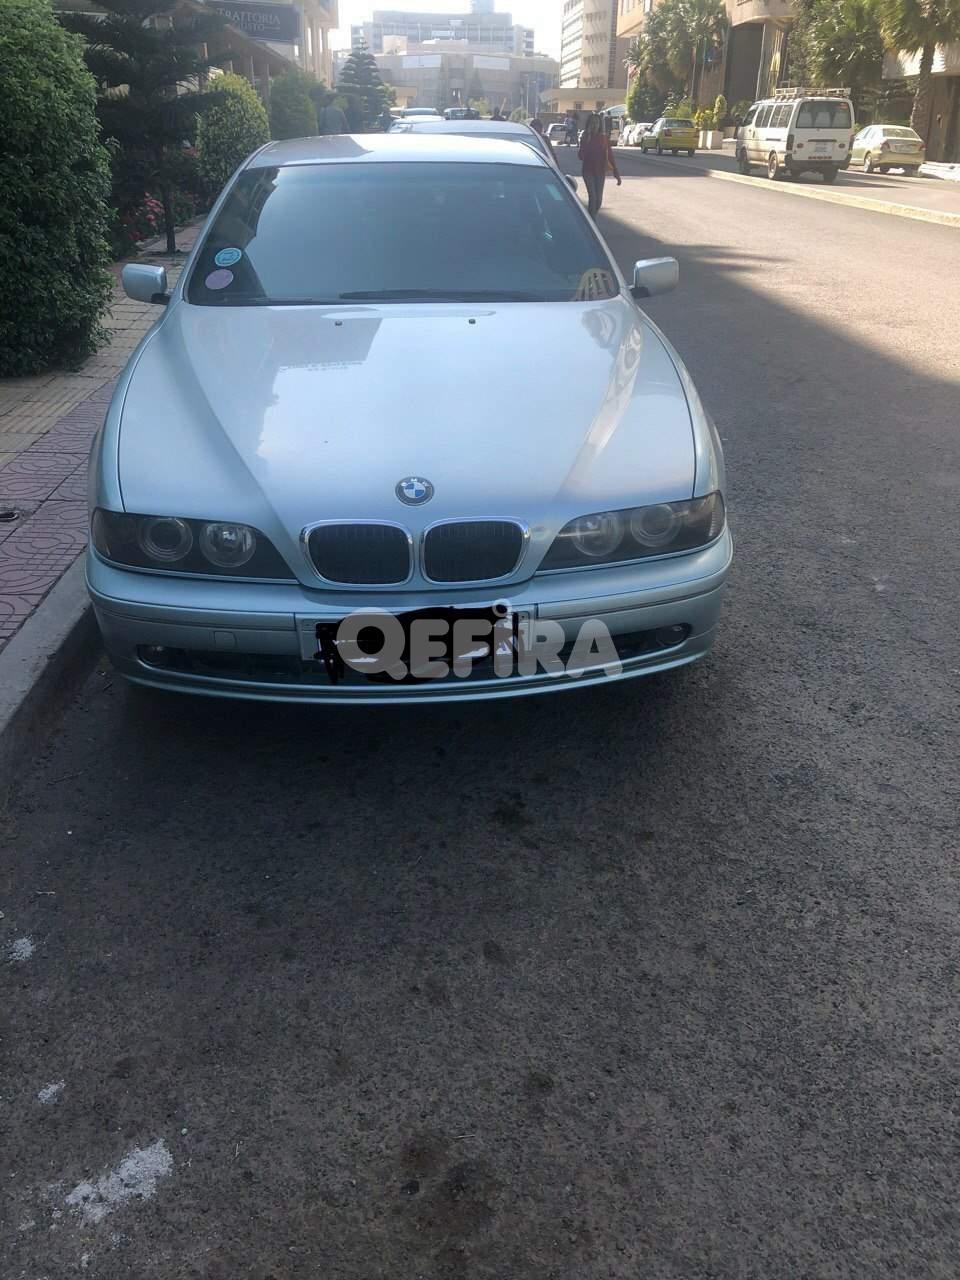 1999 Model Bmw 525i In  U12a0 U12f2 U1235  U12a0 U1260 U1263  U1218 U1235 U1270 U12f3 U12f5 U122d